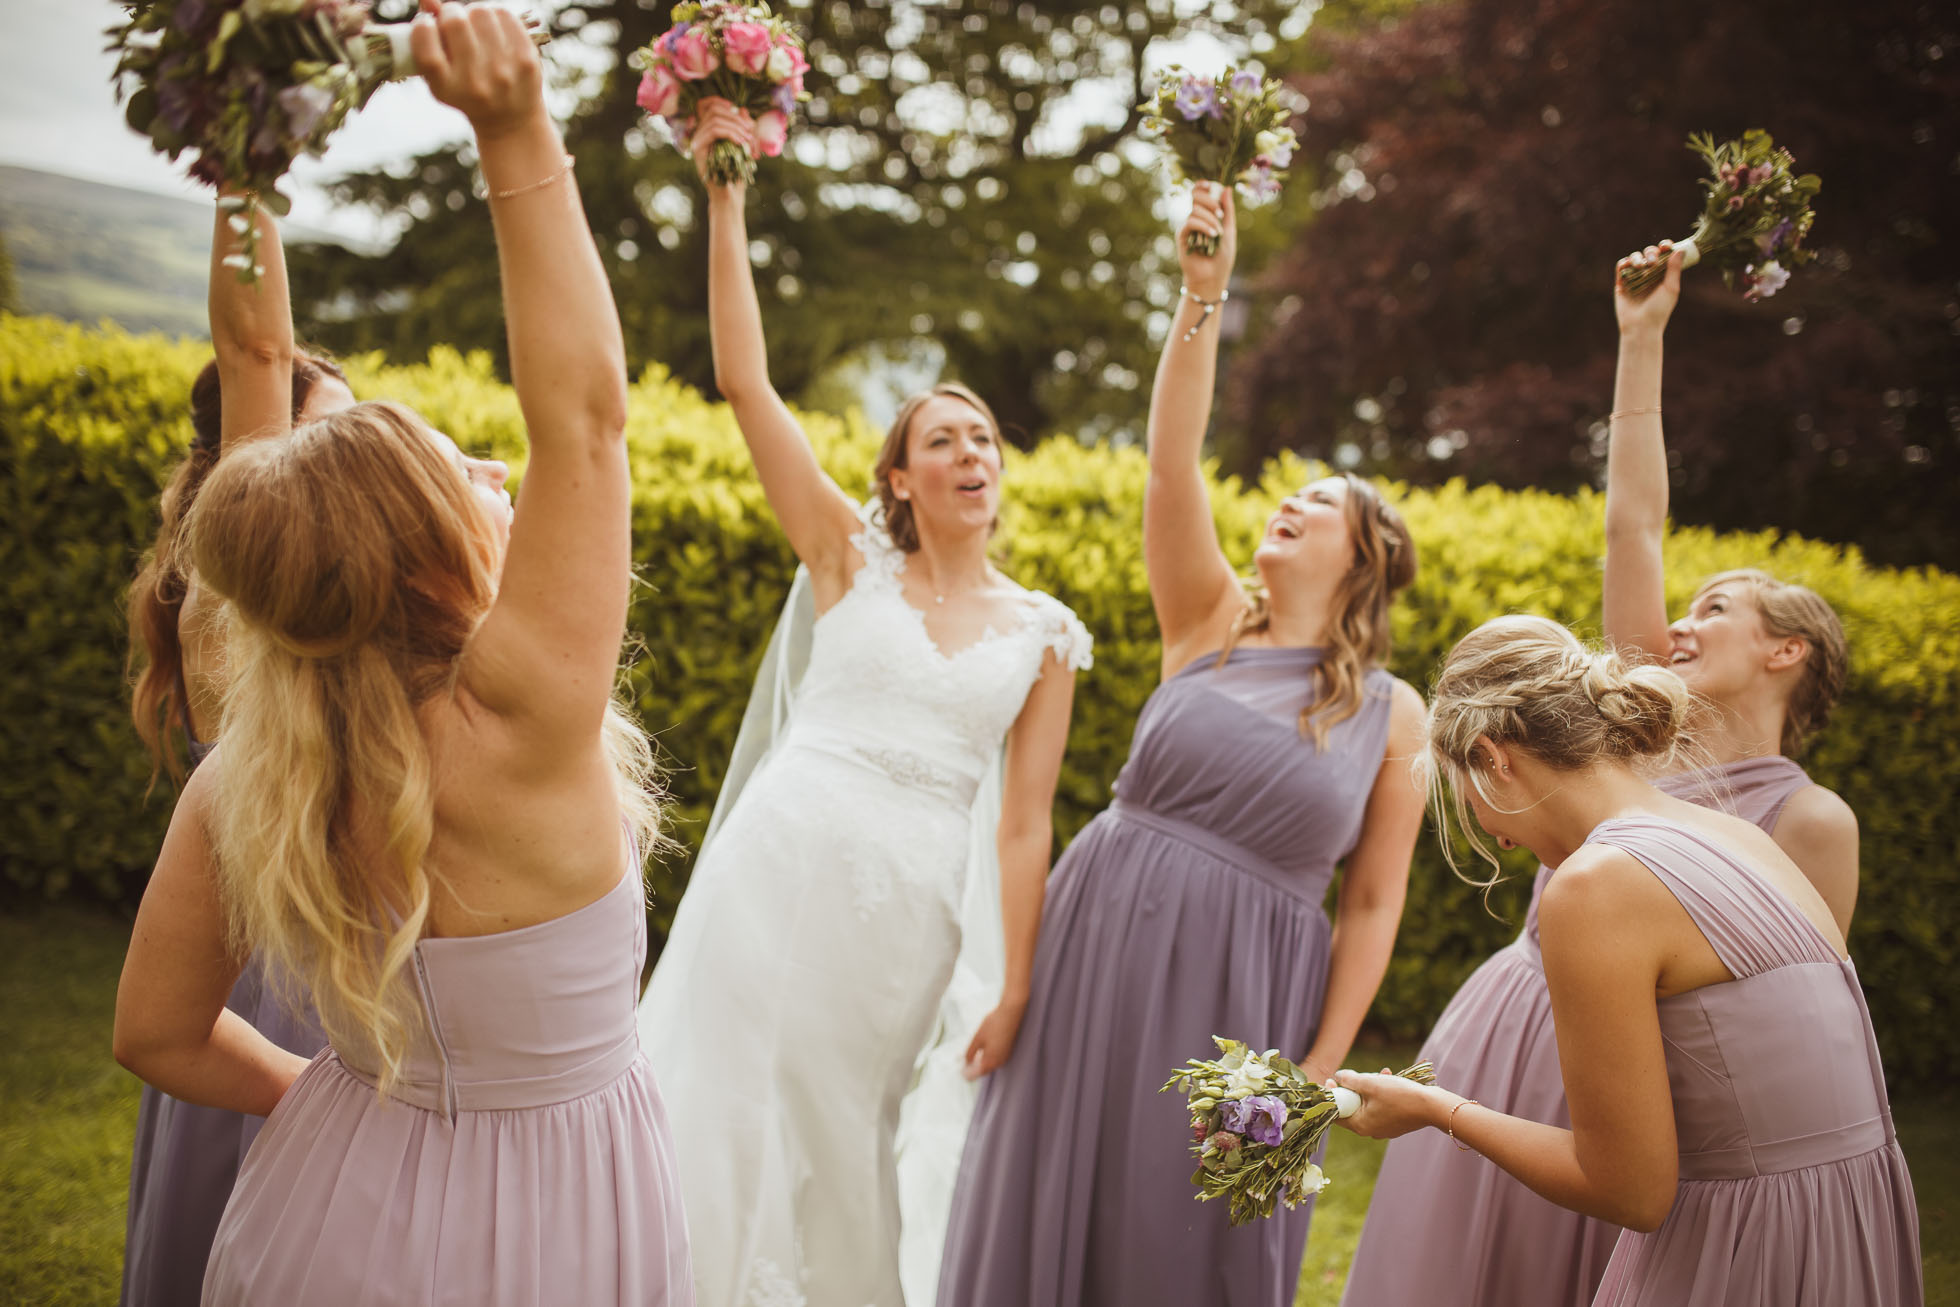 denton-hall-wedding-photographer-46.jpg